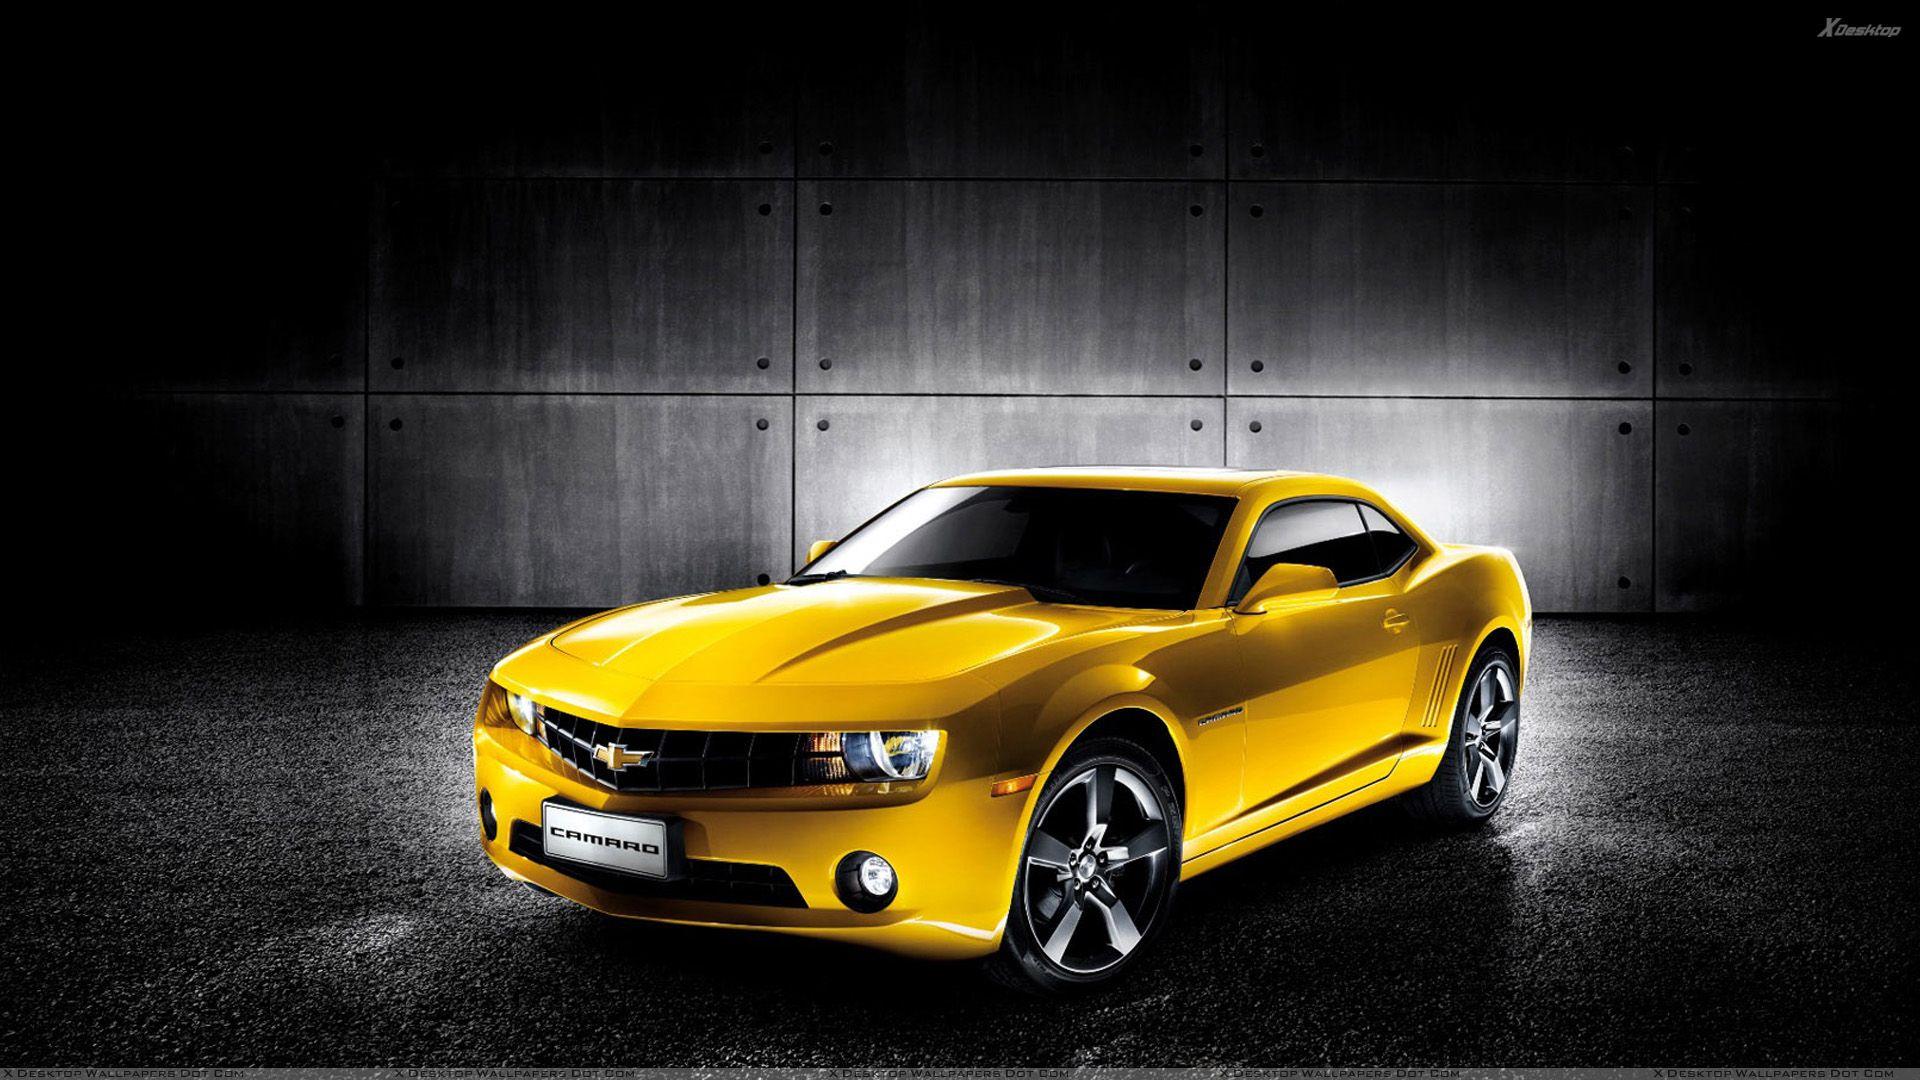 Chevrolet Camaro Wallpaper 1080p Cars Wallpapers Hd Chevrolet Camaro Yellow Chevrolet Camaro